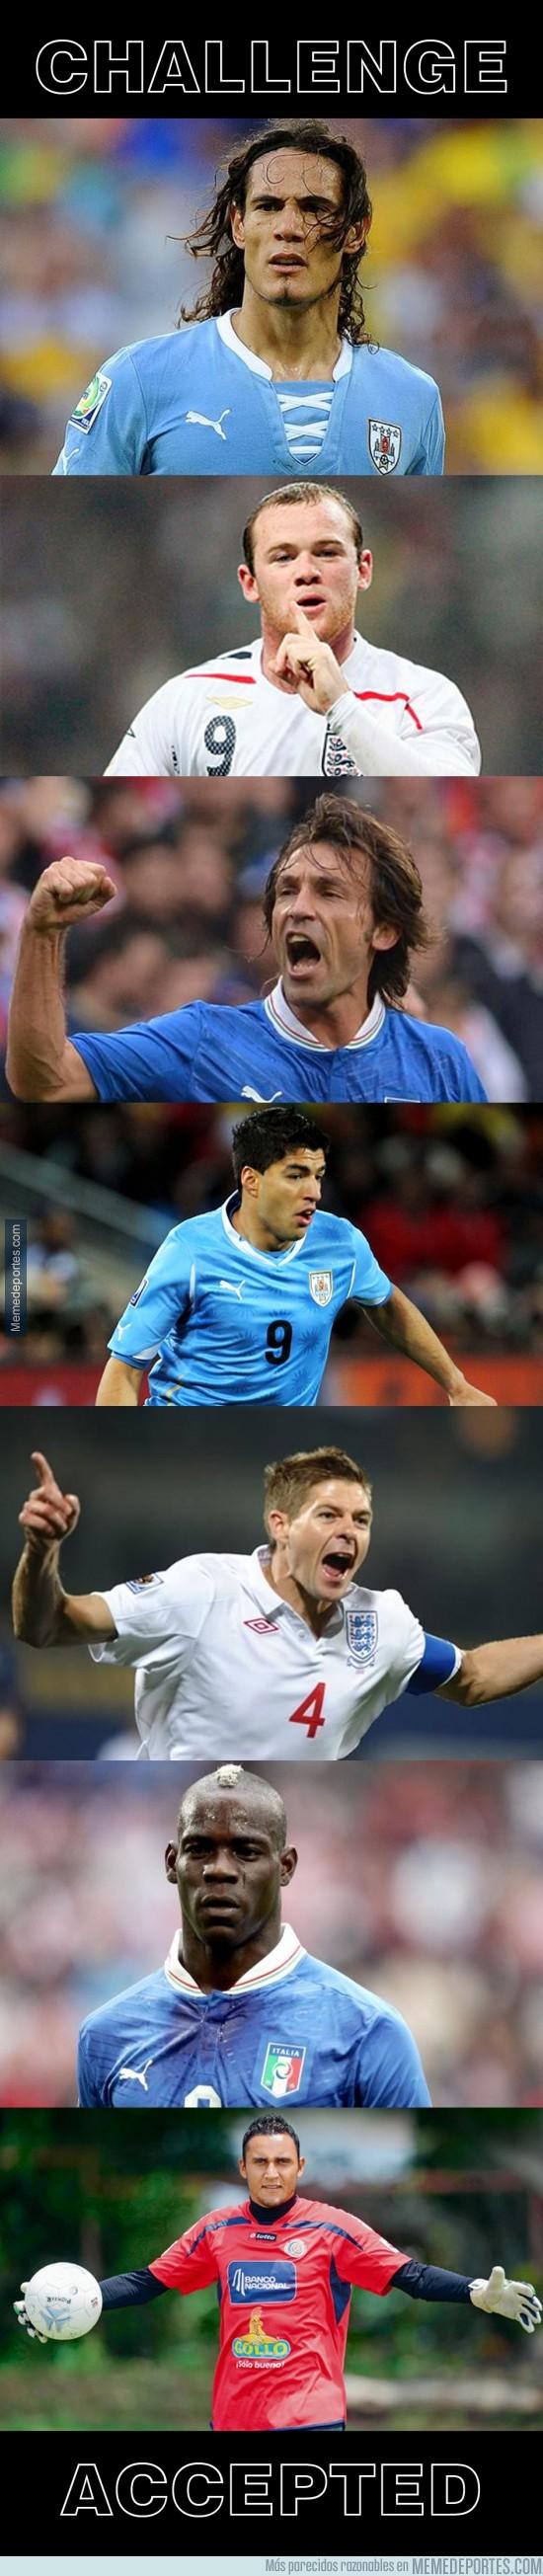 321738 - Italia, Inglaterra, Uruguay frente a... Keylor Navas